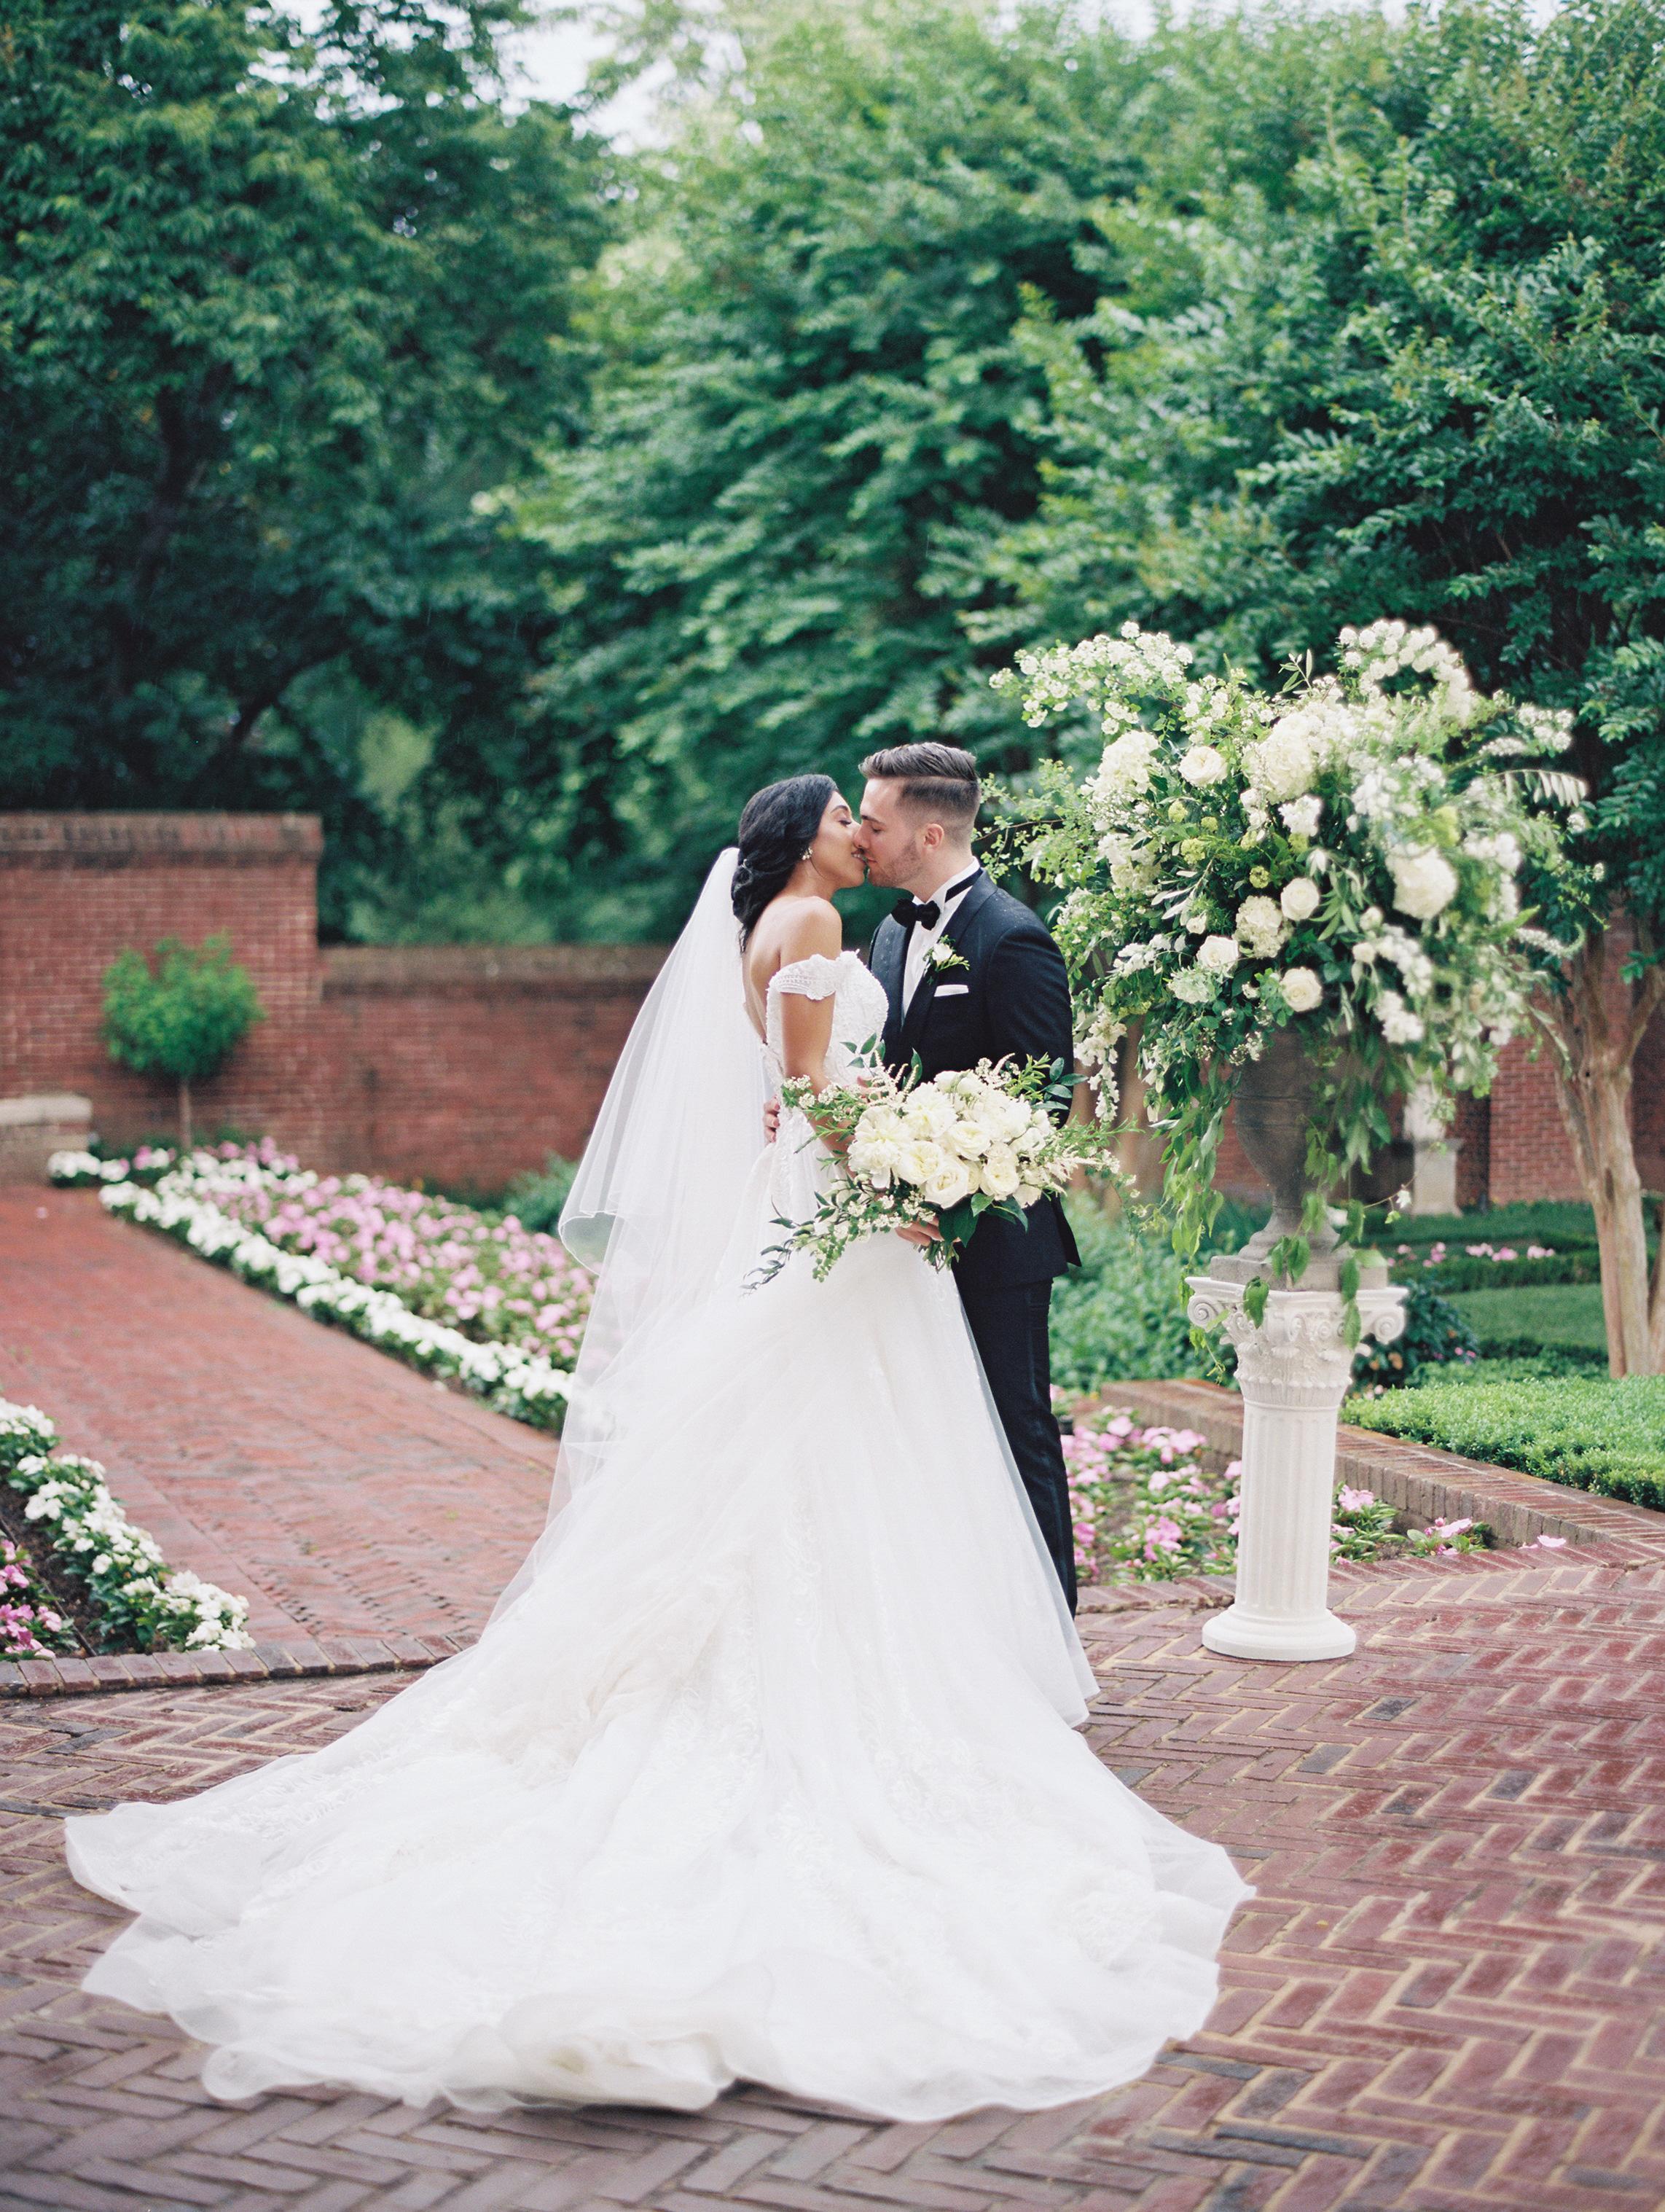 macey joshua wedding couple kissing in garden